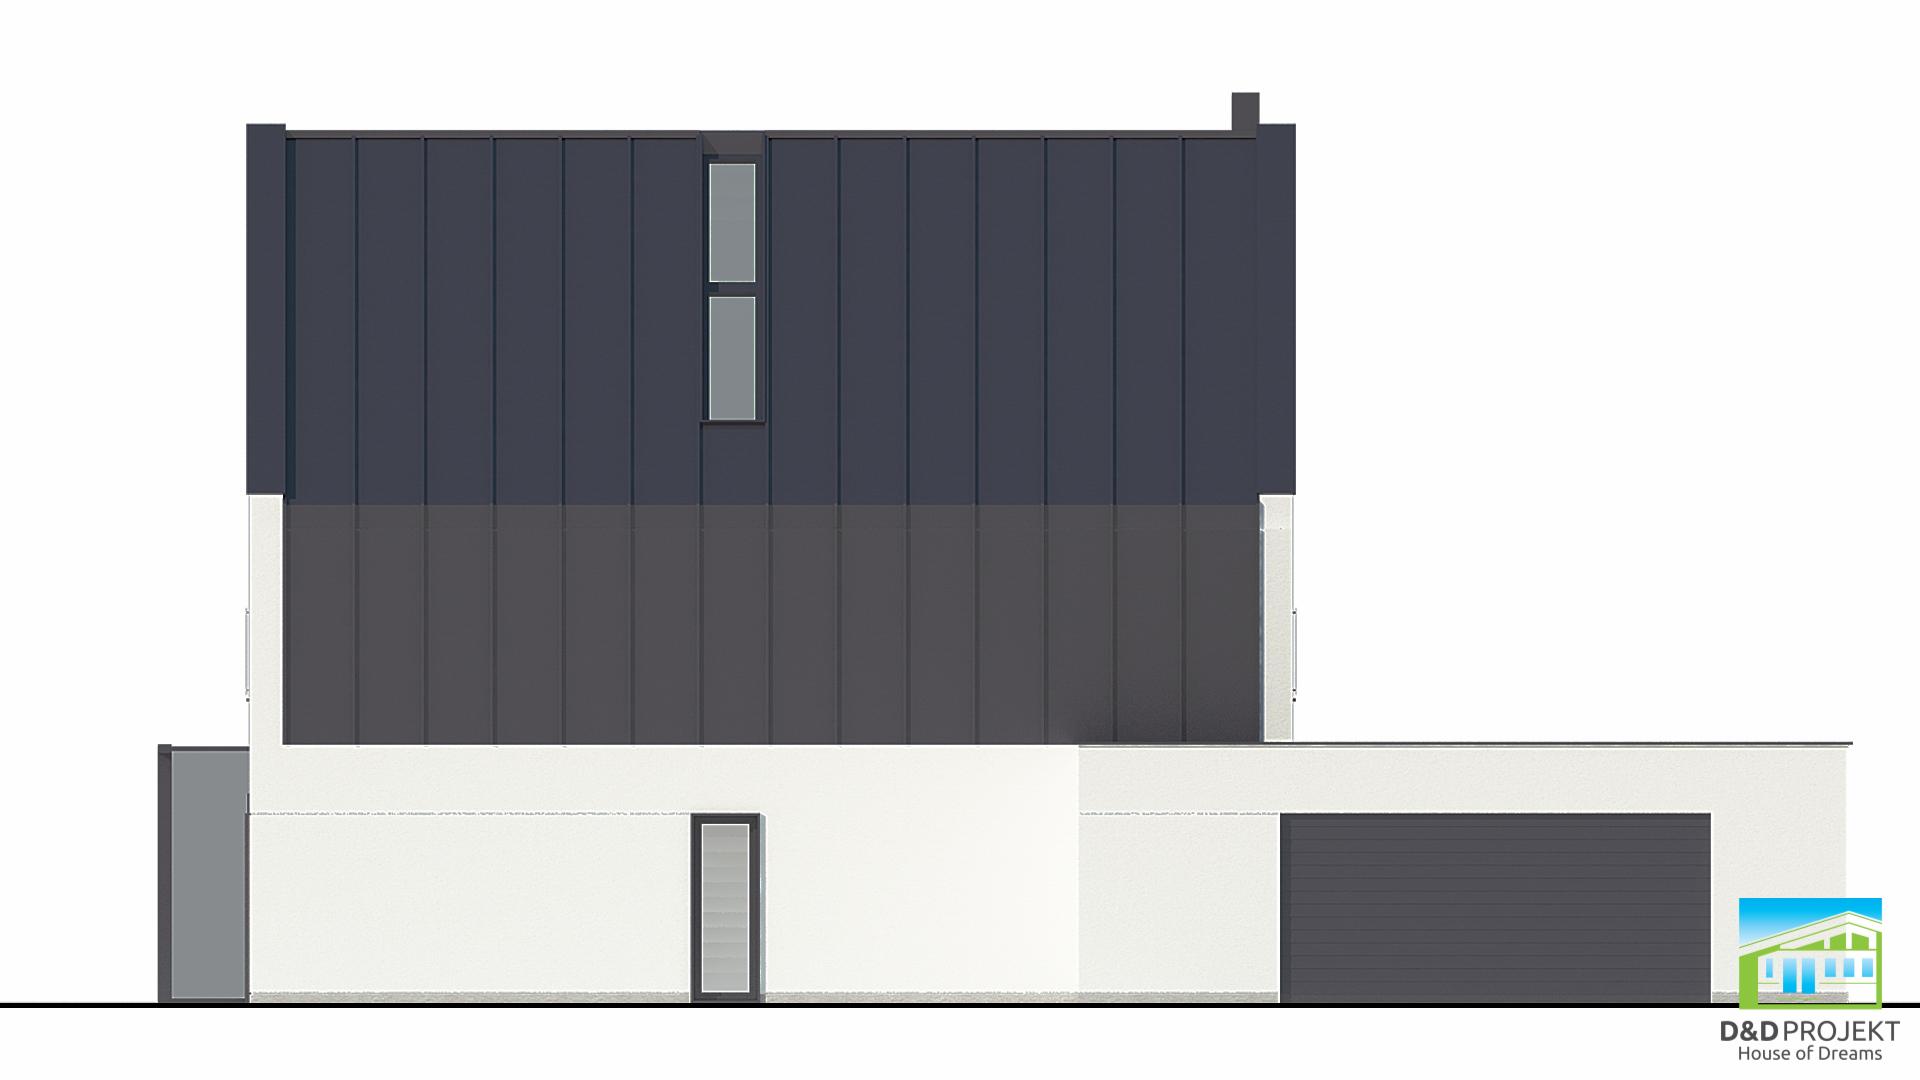 https://ddprojekt.pl/wp-content/uploads/2020/03/elewacja3.jpg